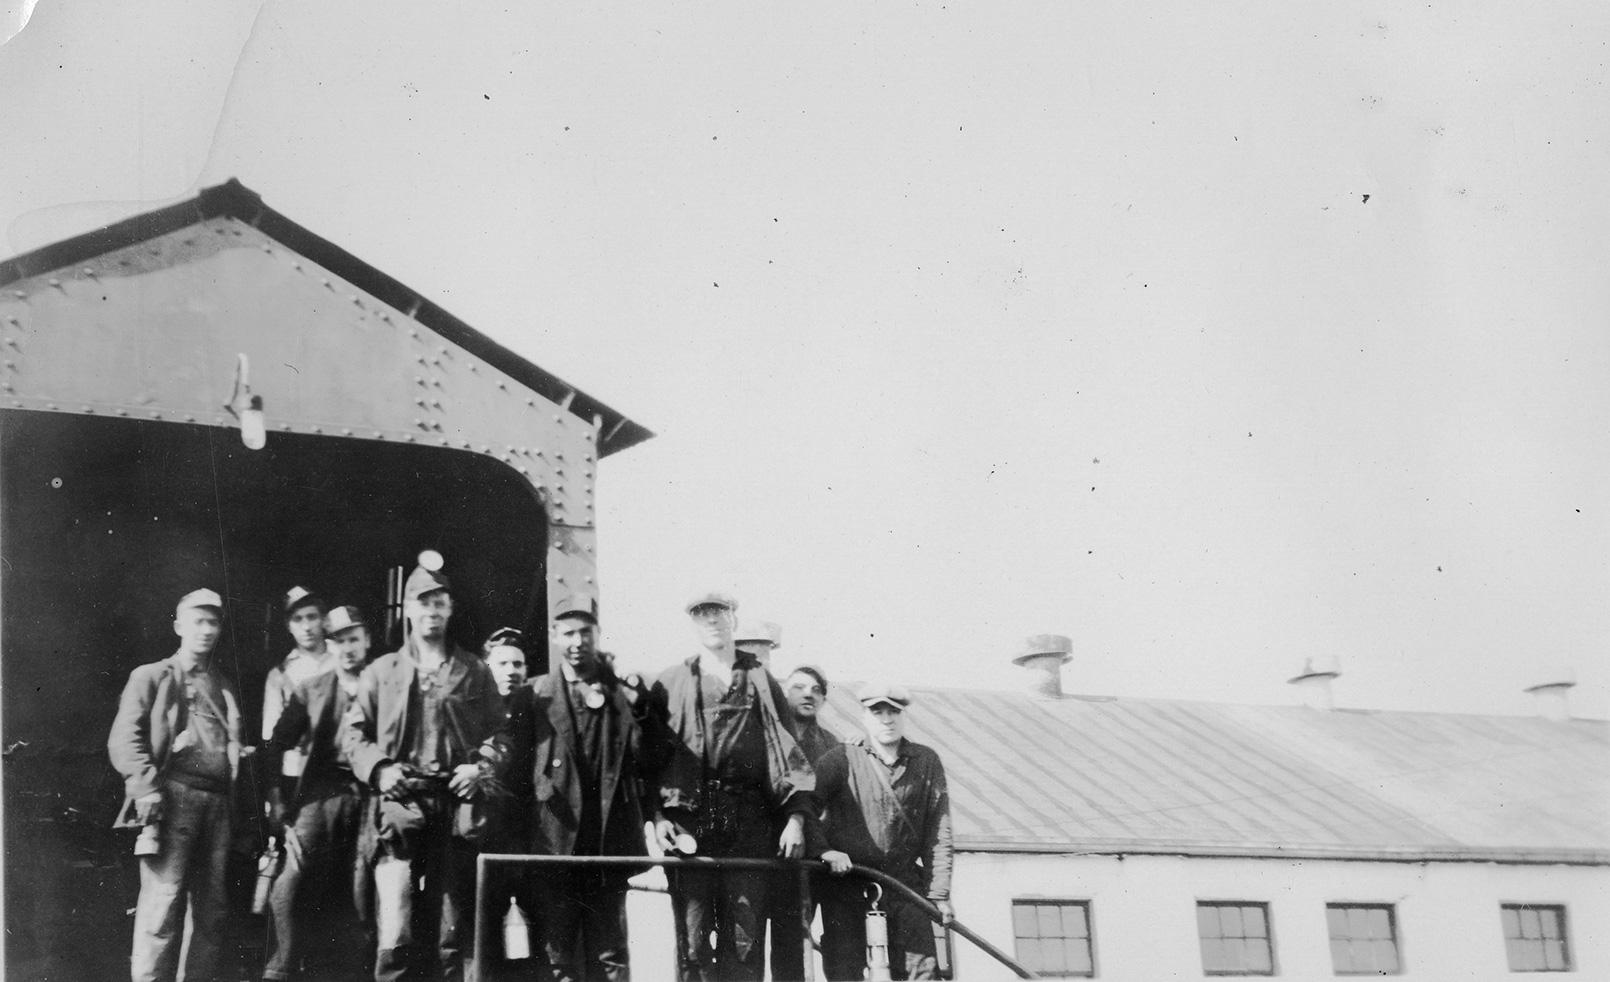 Albion Mine, Pictou County, NS. (Source: Nova Scotia Archives https://archives.novascotia.ca/)